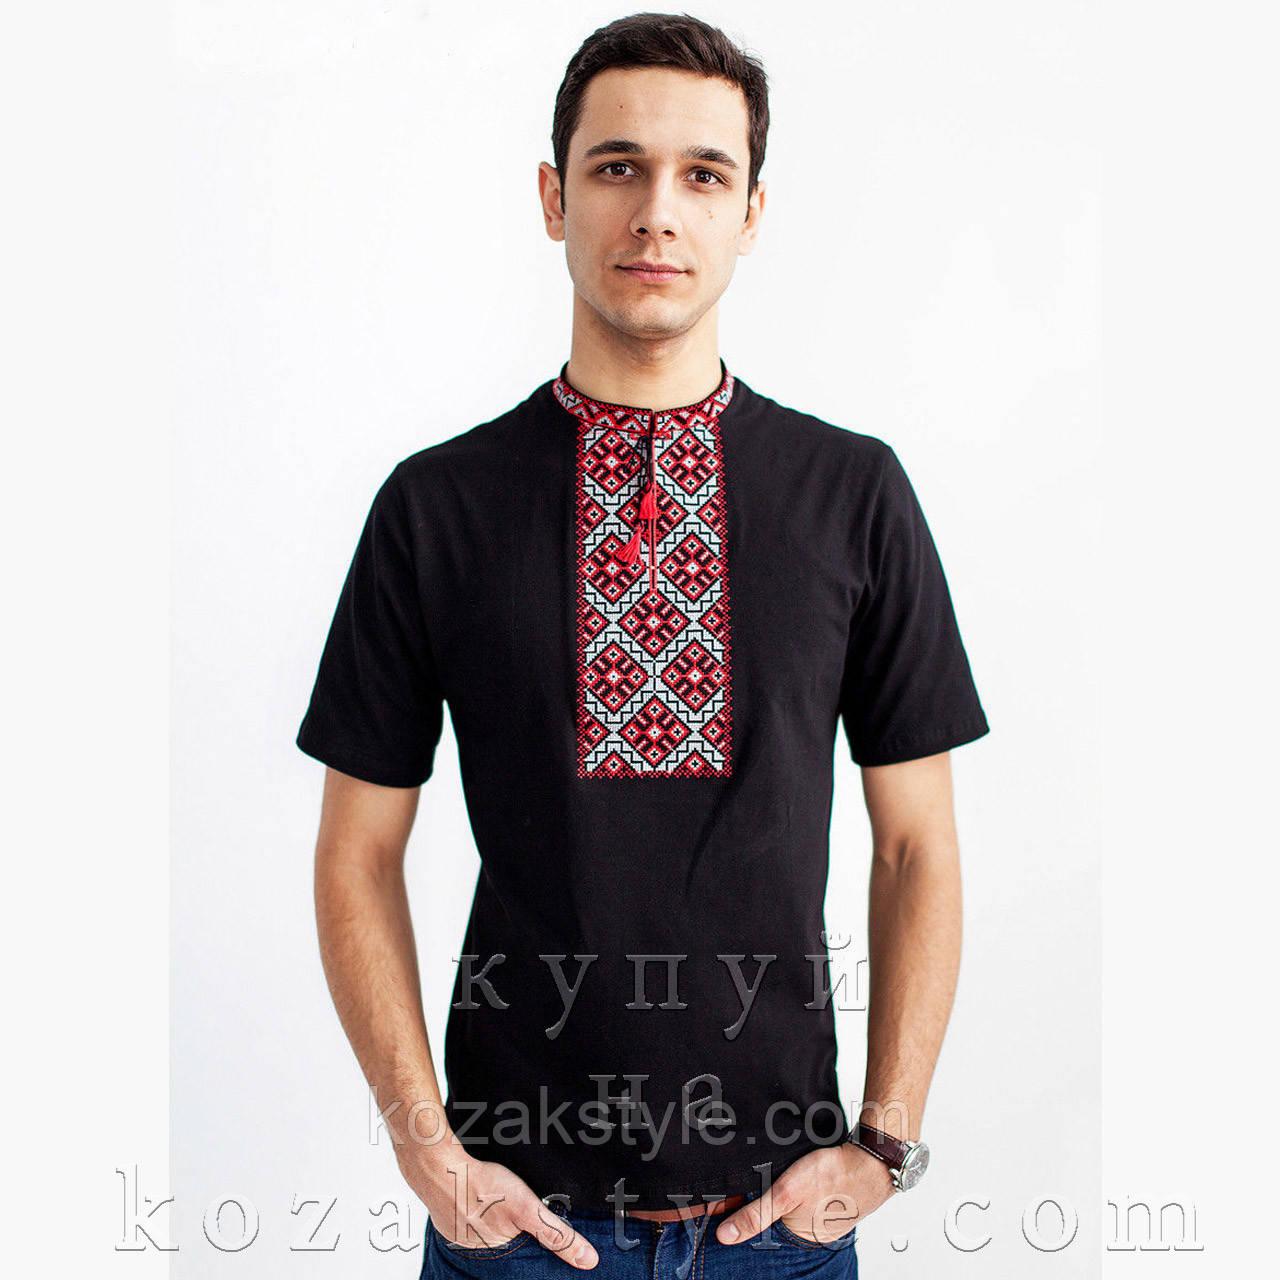 Трикотажна вишиванка Козацька чорна